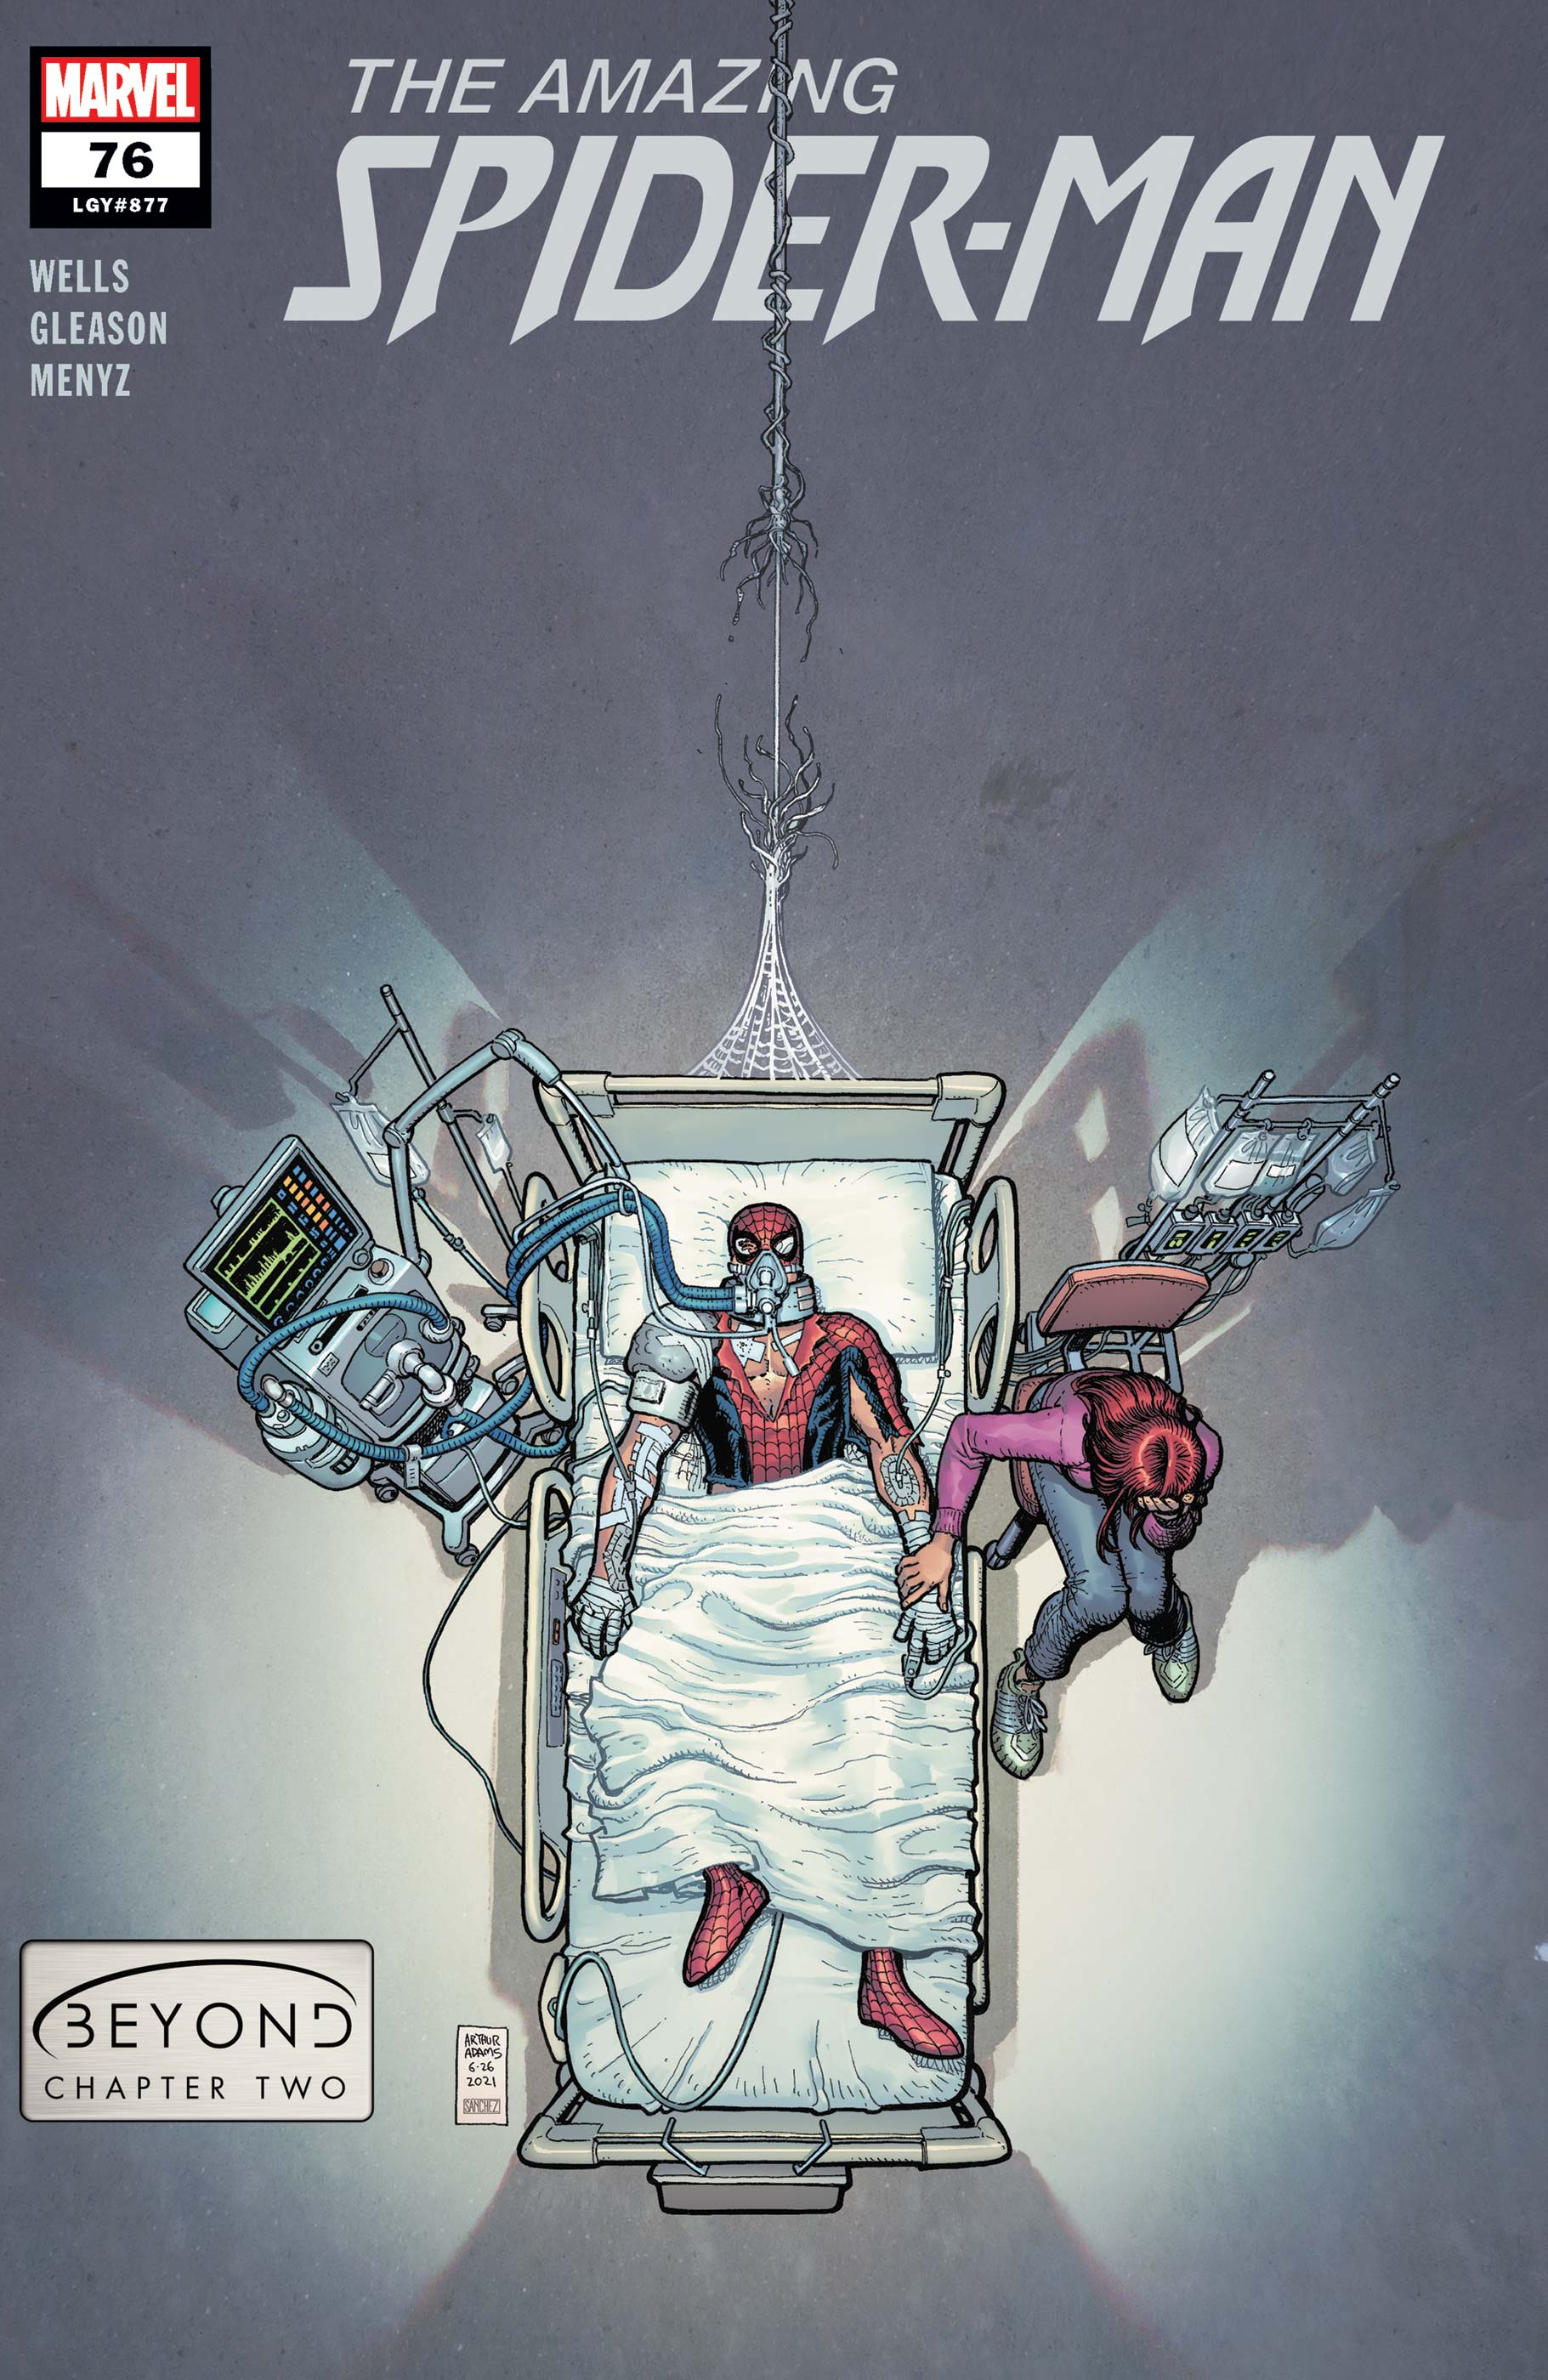 The Amazing Spider-Man (2018) #76